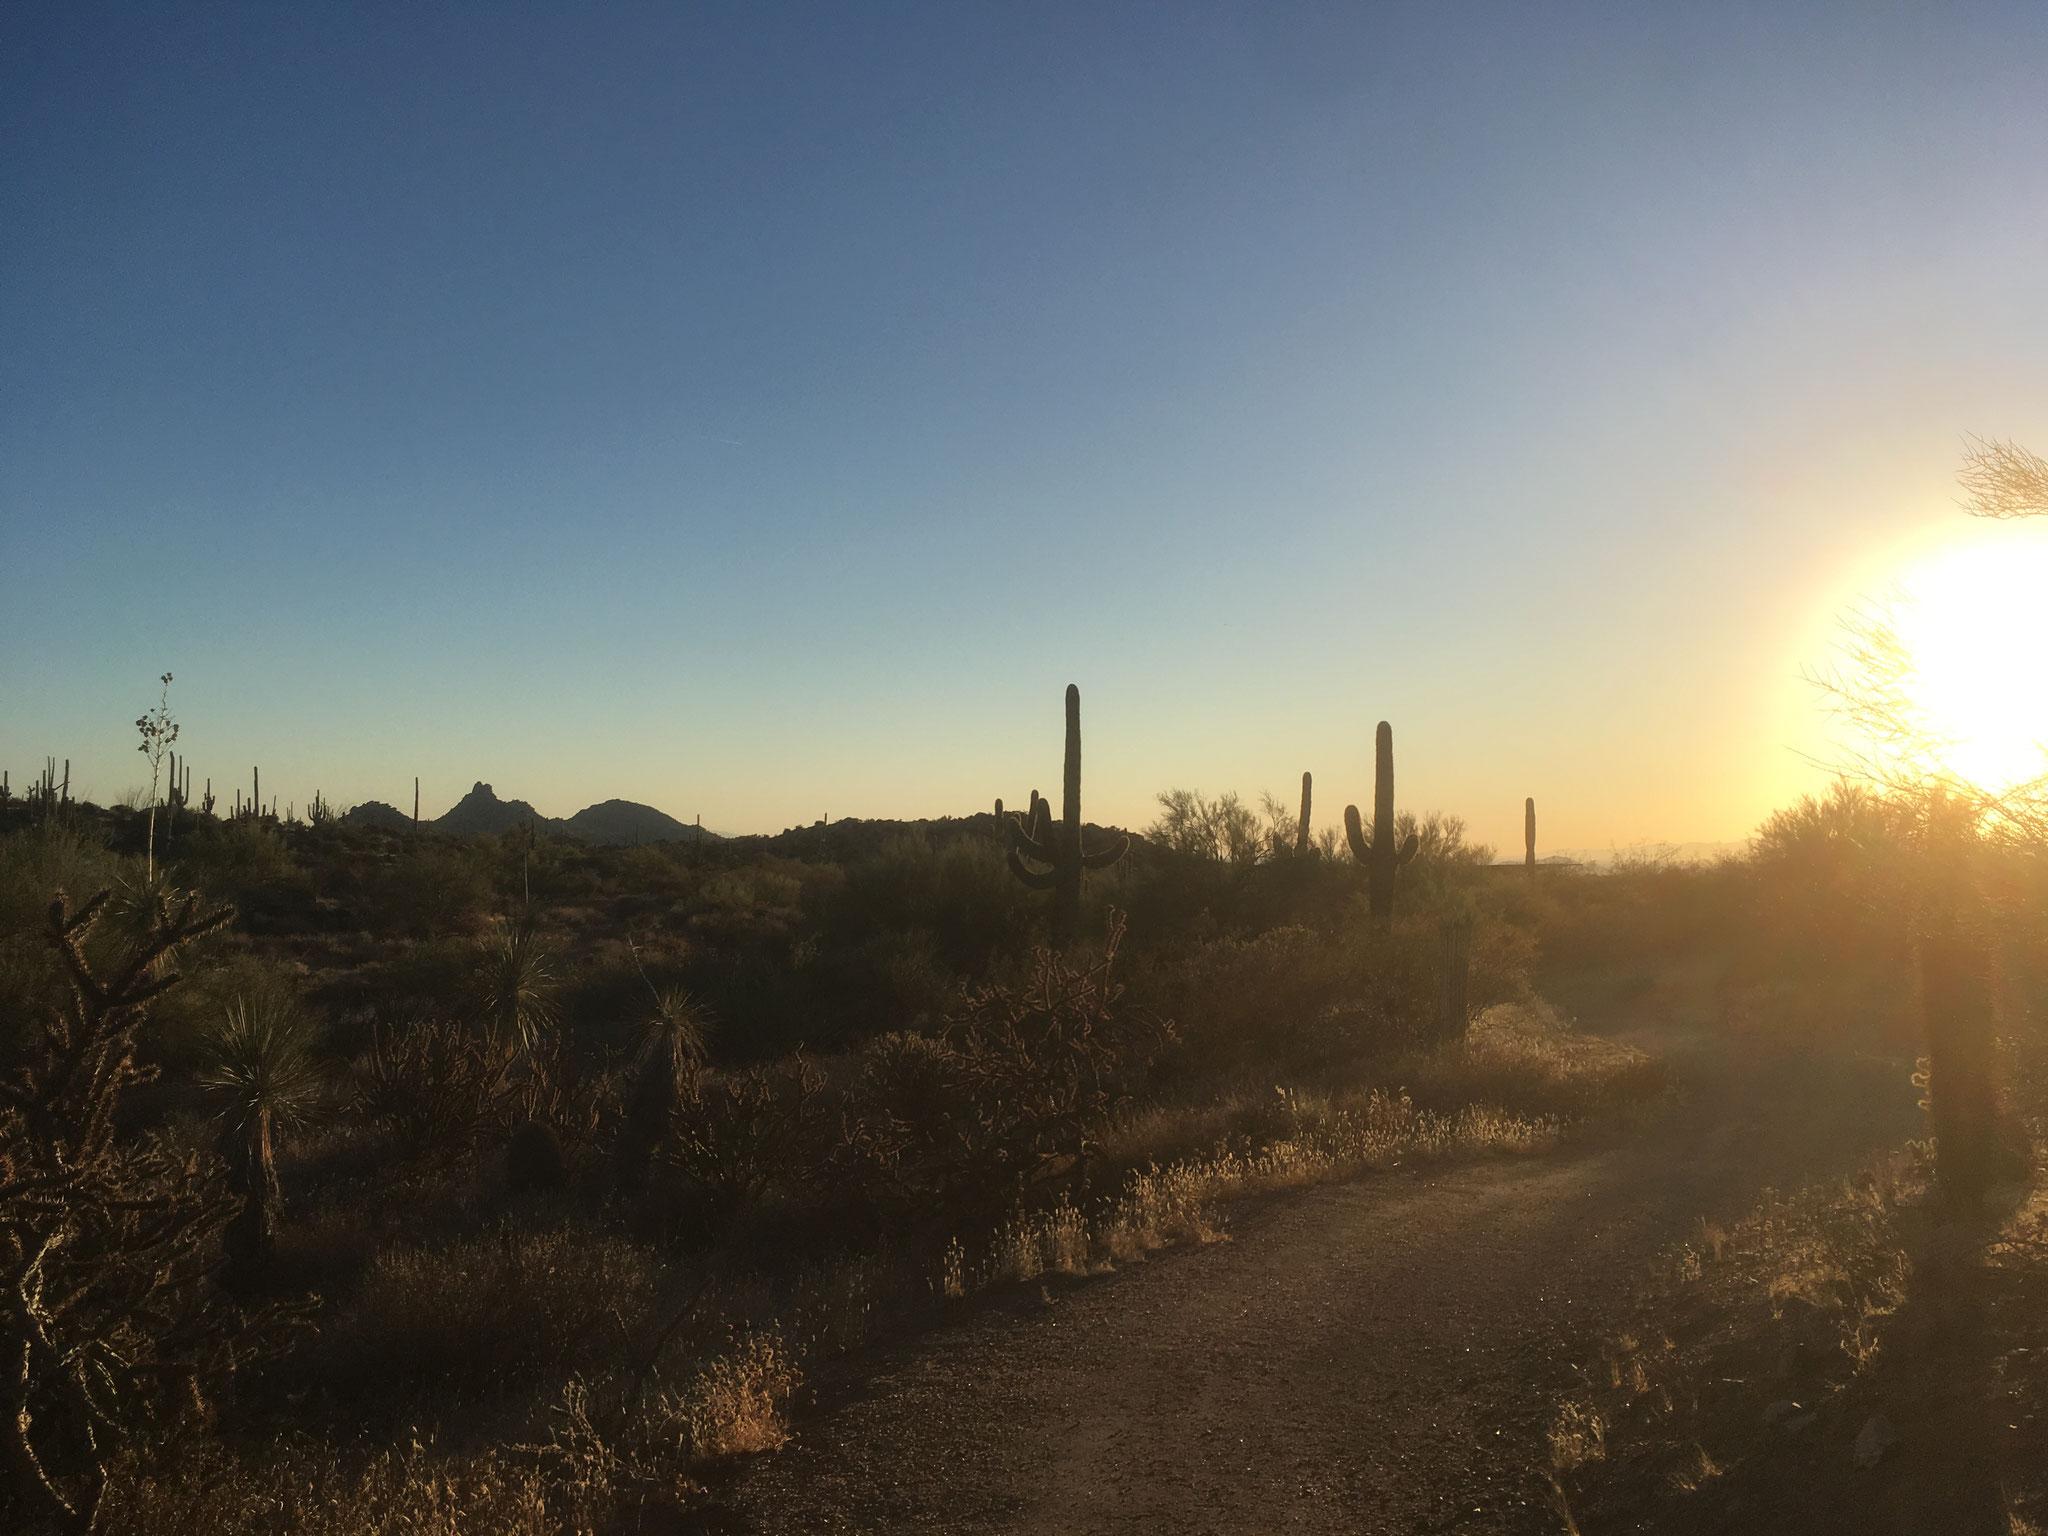 Mc Dowell Sonoran Preserve (Arizona)